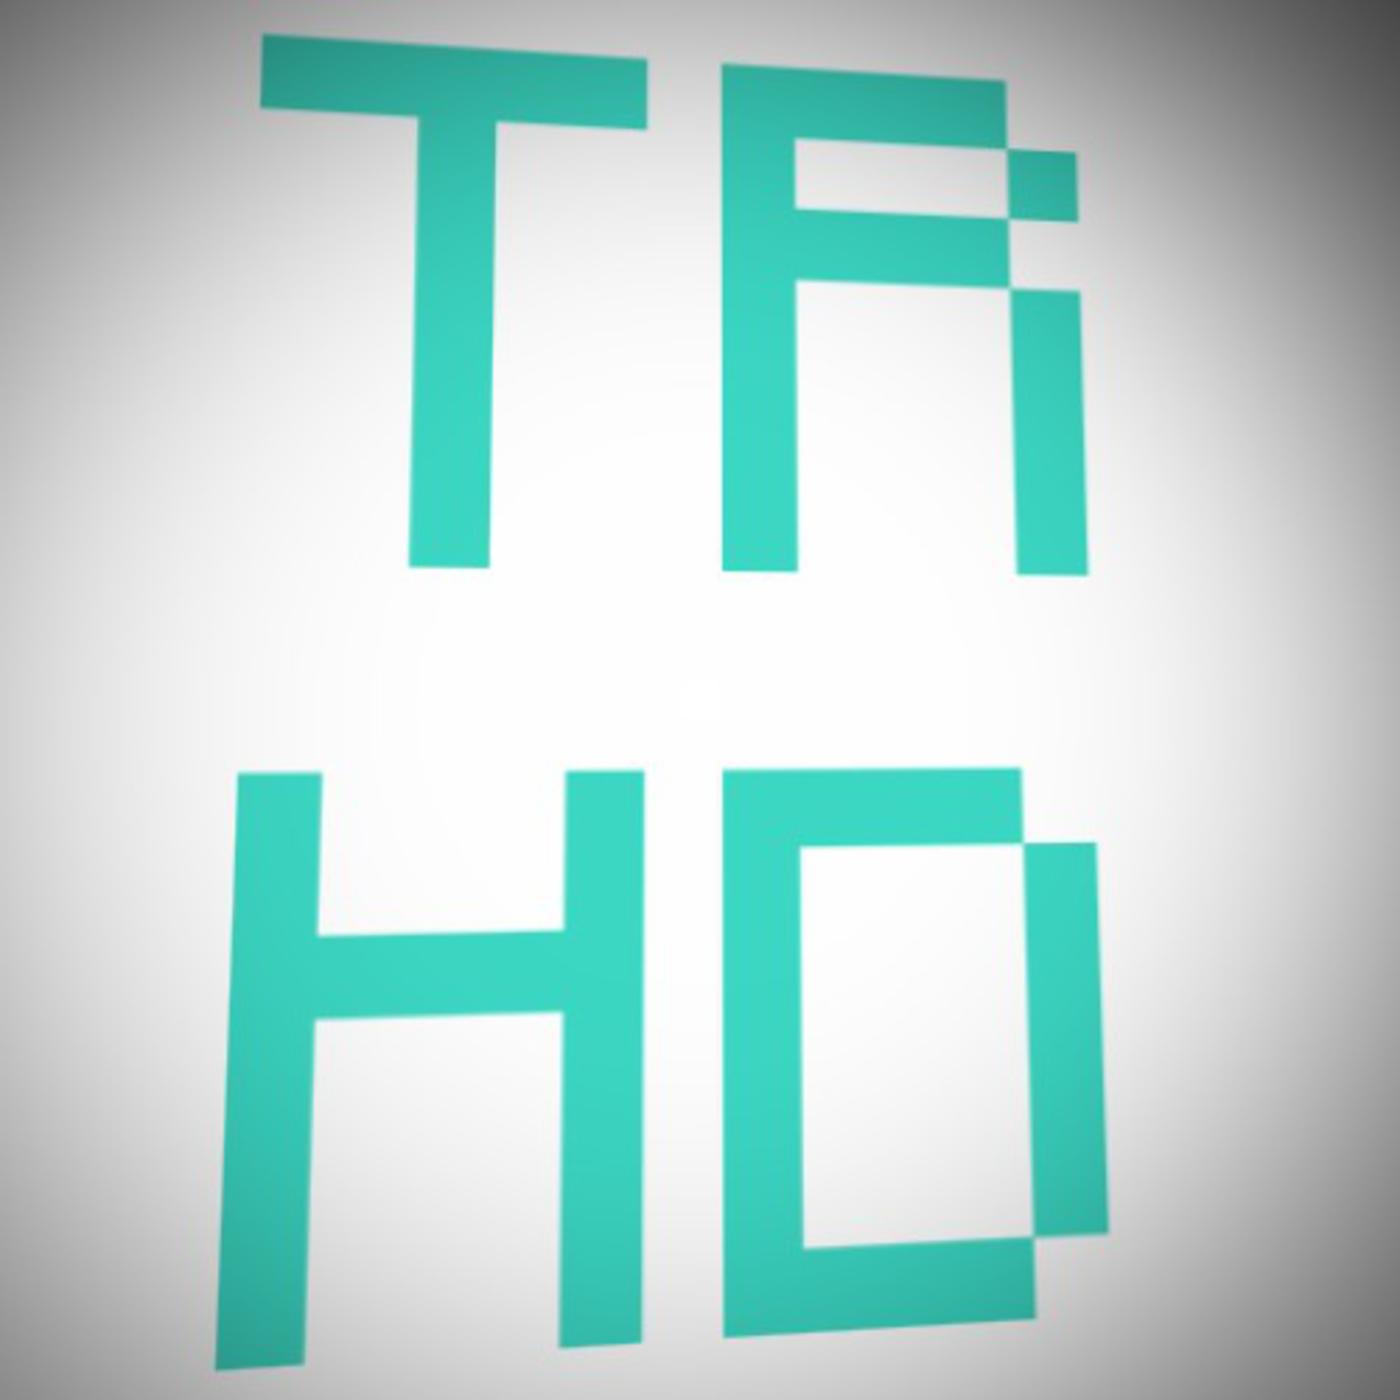 TechReviewersHD